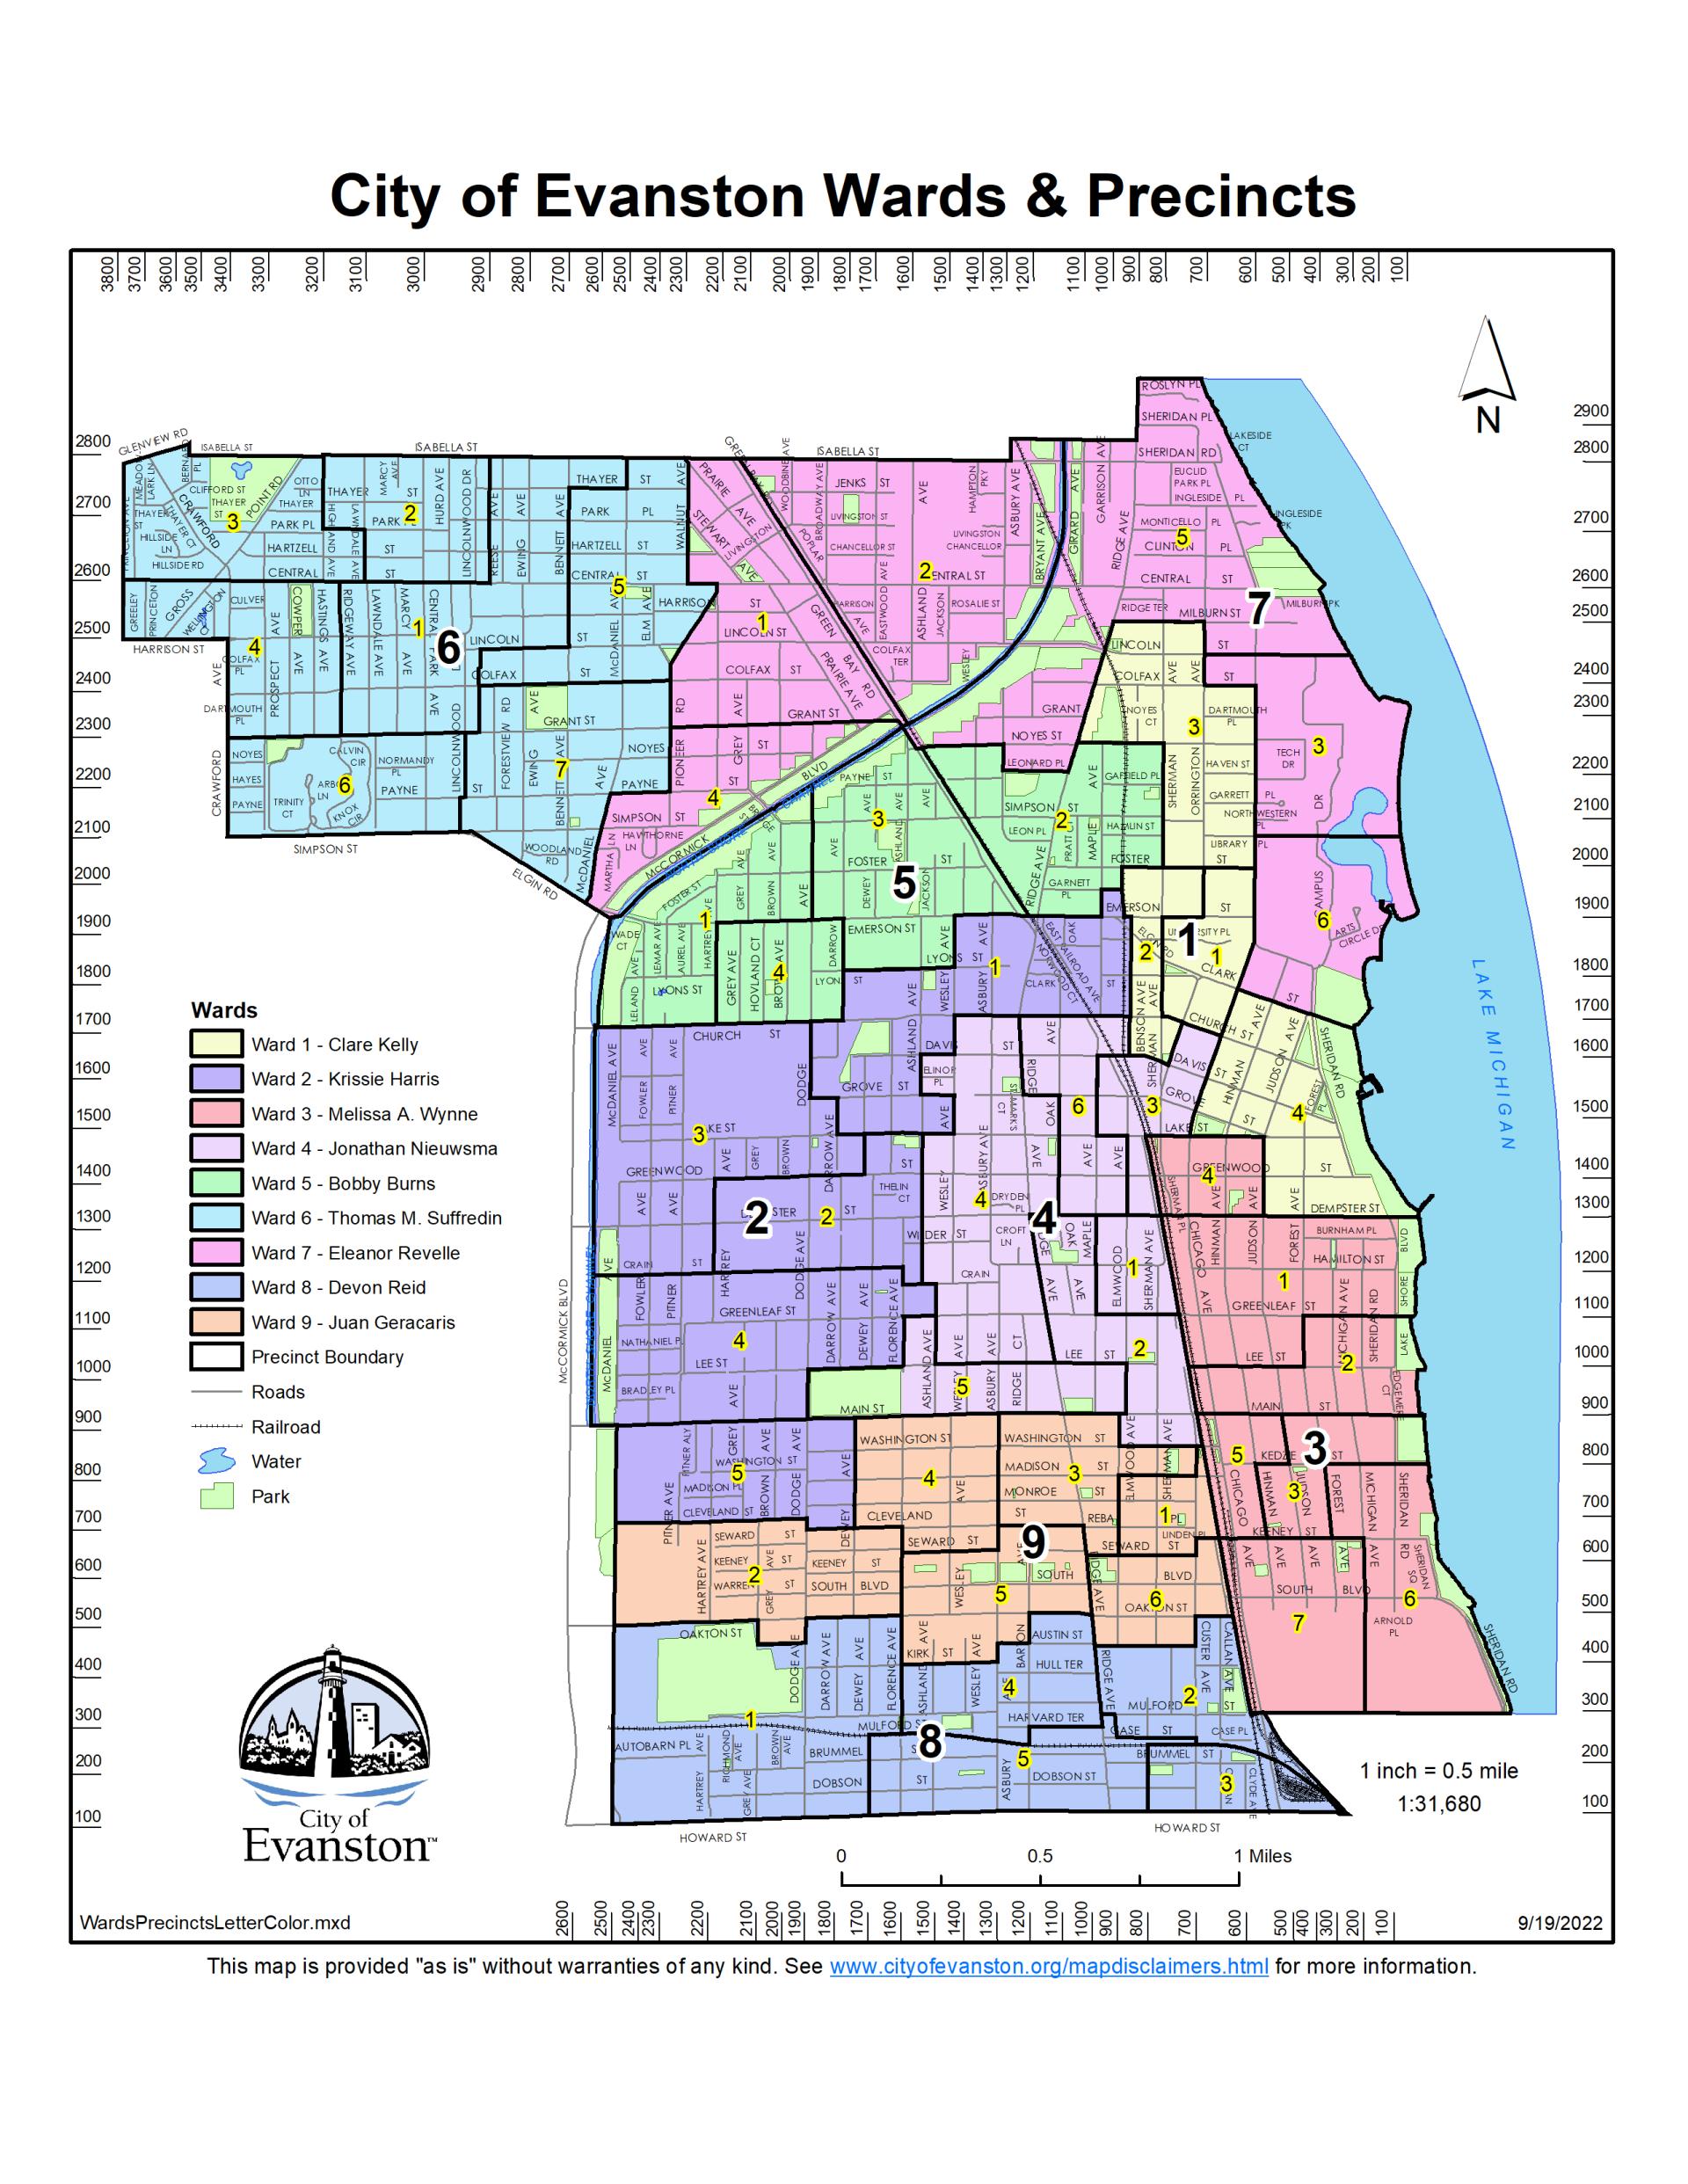 Permit Parking Chicago Map.Maps City Of Evanston